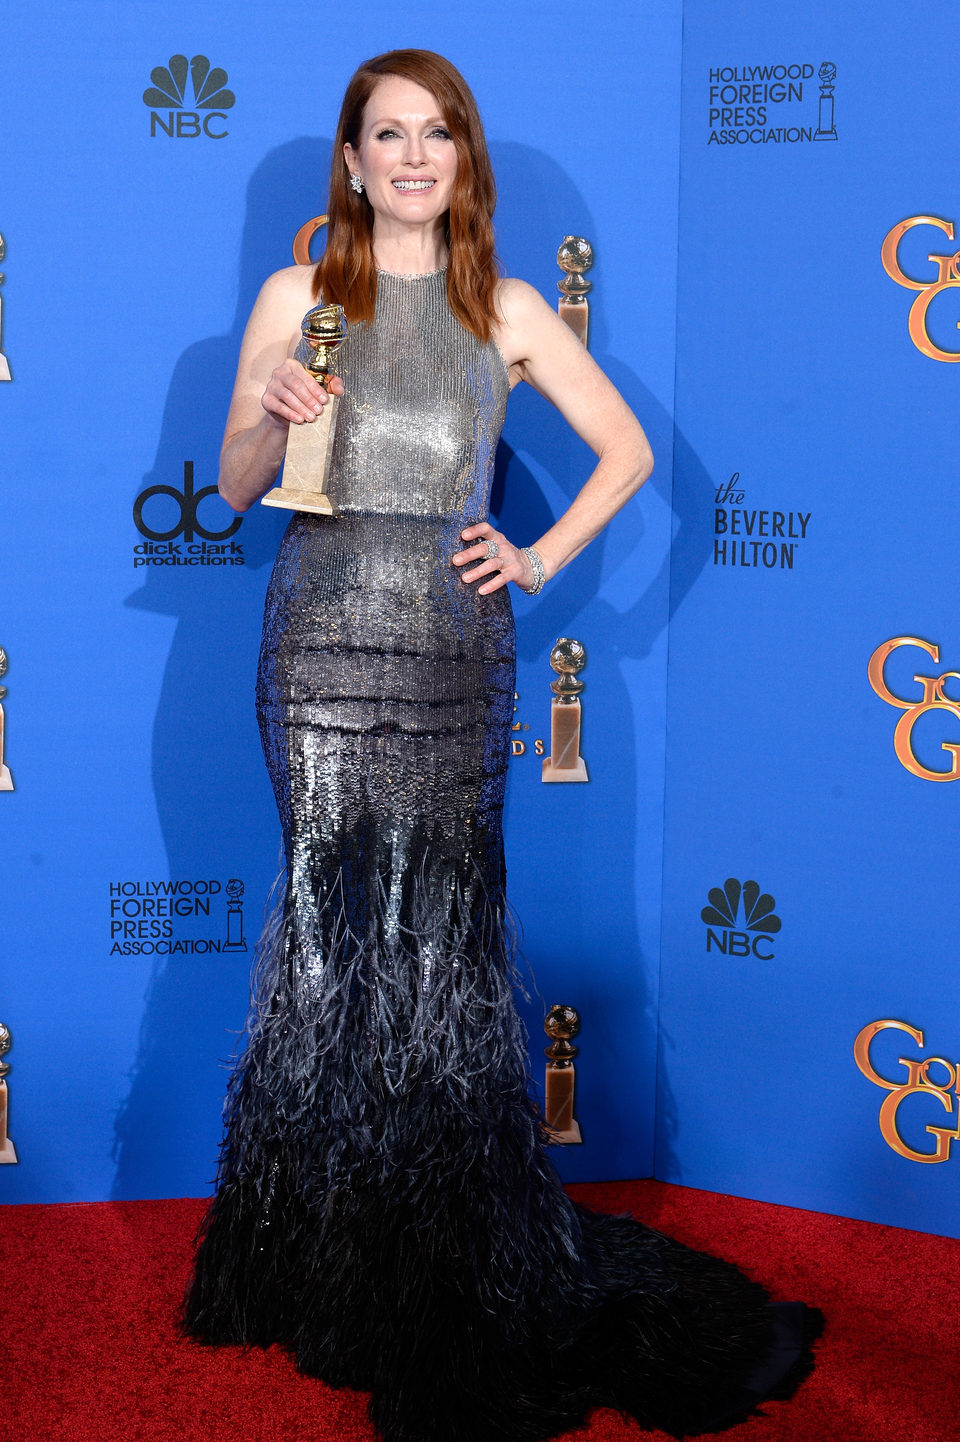 Julianne Moore, winner of the Golden Globe 2015 for the best drama actress